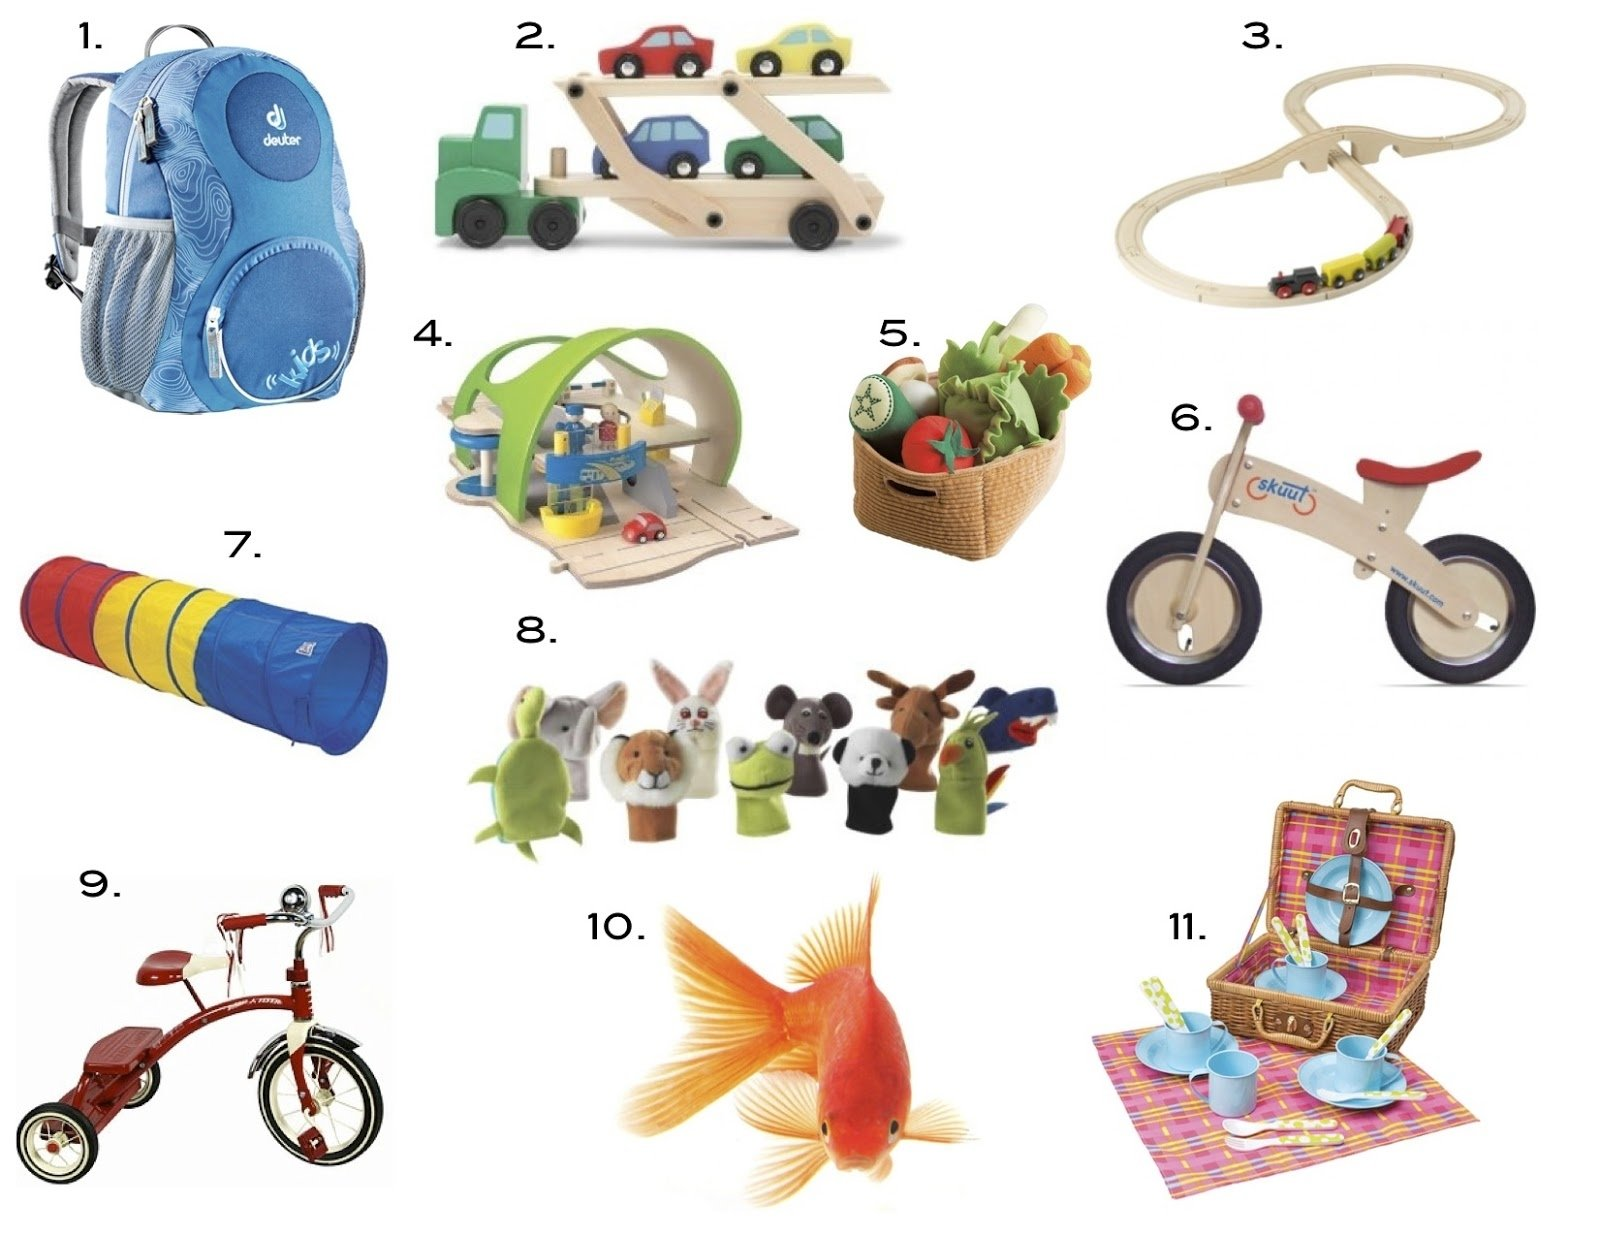 10 Fabulous 5 Year Old Boy Birthday Gift Ideas Room